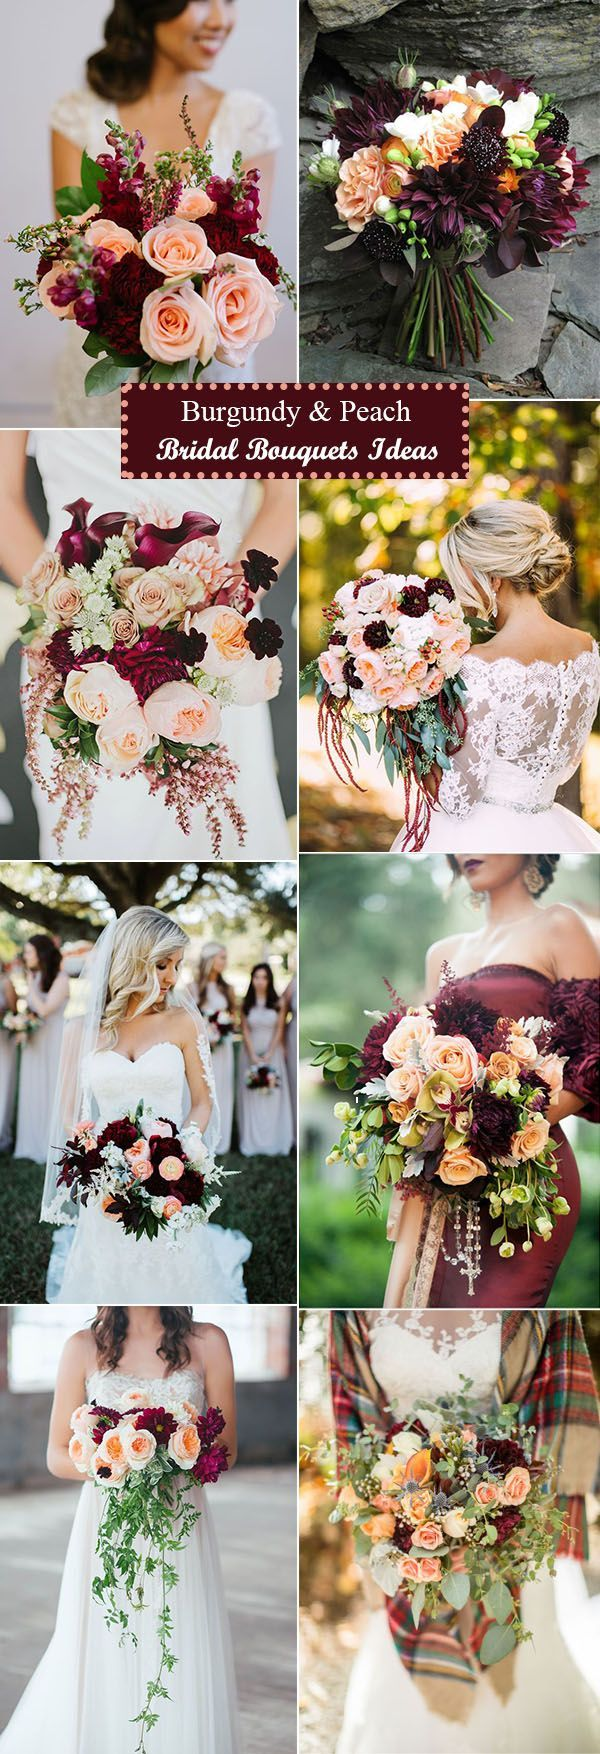 Wedding decorations in nigeria november 2018  best Wedding stuff images on Pinterest  Wedding ideas Weddings